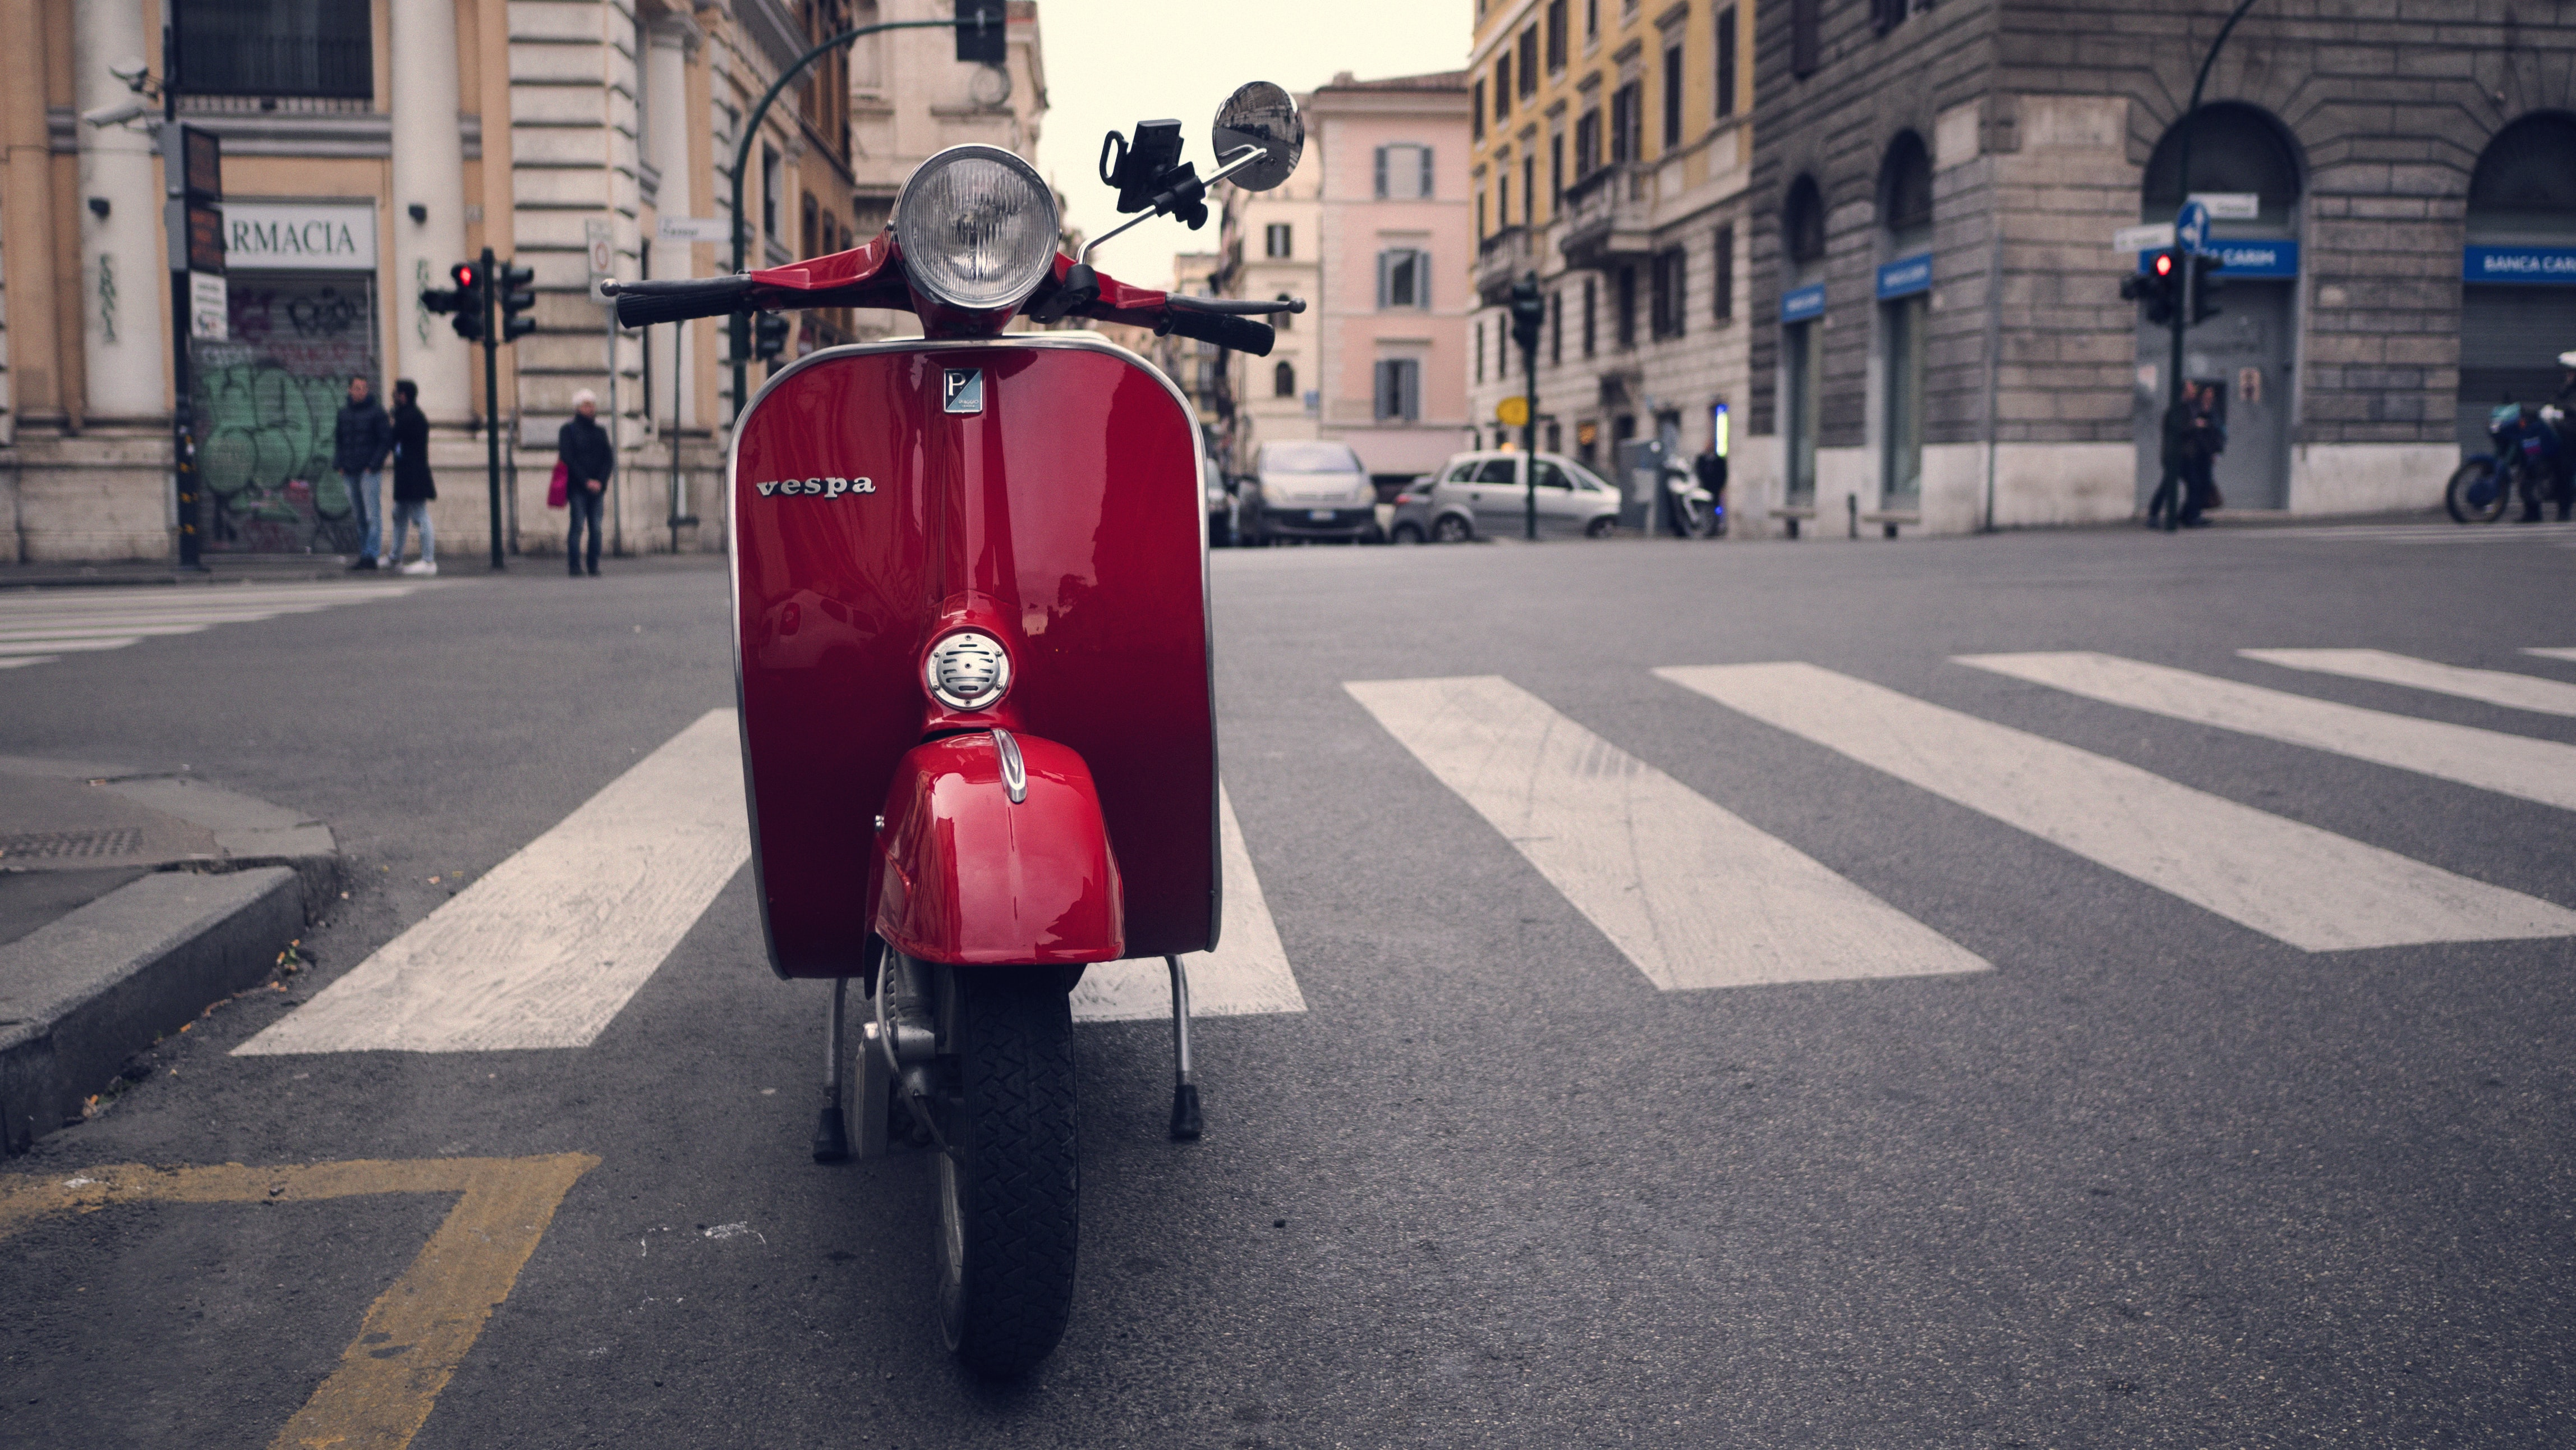 100 Vespa Pictures Download Free Images On Unsplash